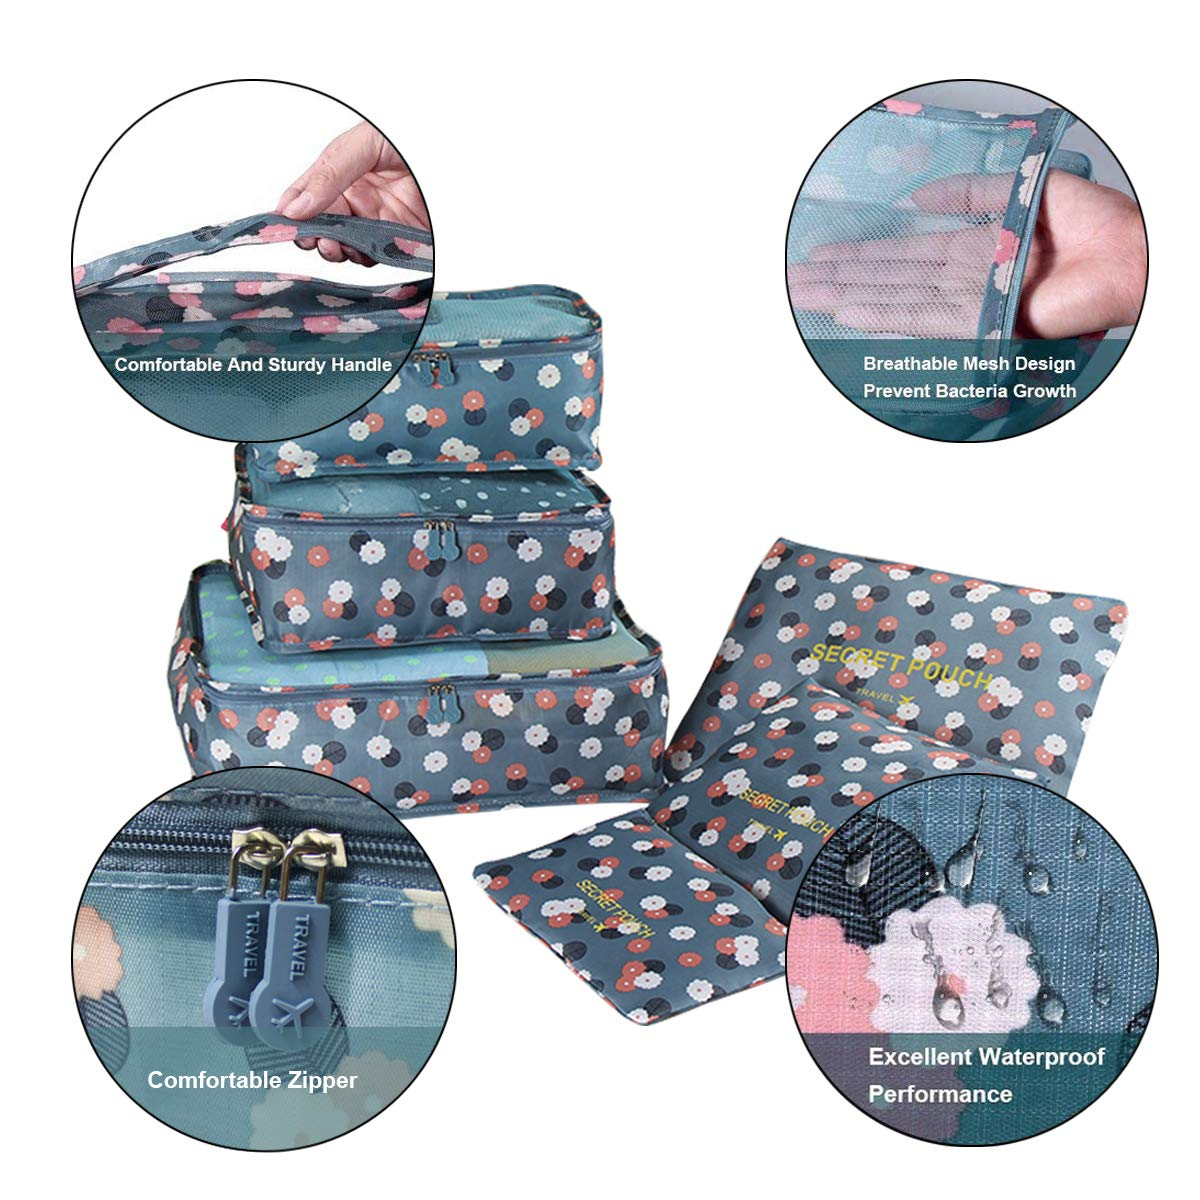 6 en 1 Set de Organizador de Equipaje Material Impermeable Organizadores de Viaje para Maletas Bolsas de Equipaje Bolsa para Ropa Zapatos Cosm/éticos Accesorios de Viaje